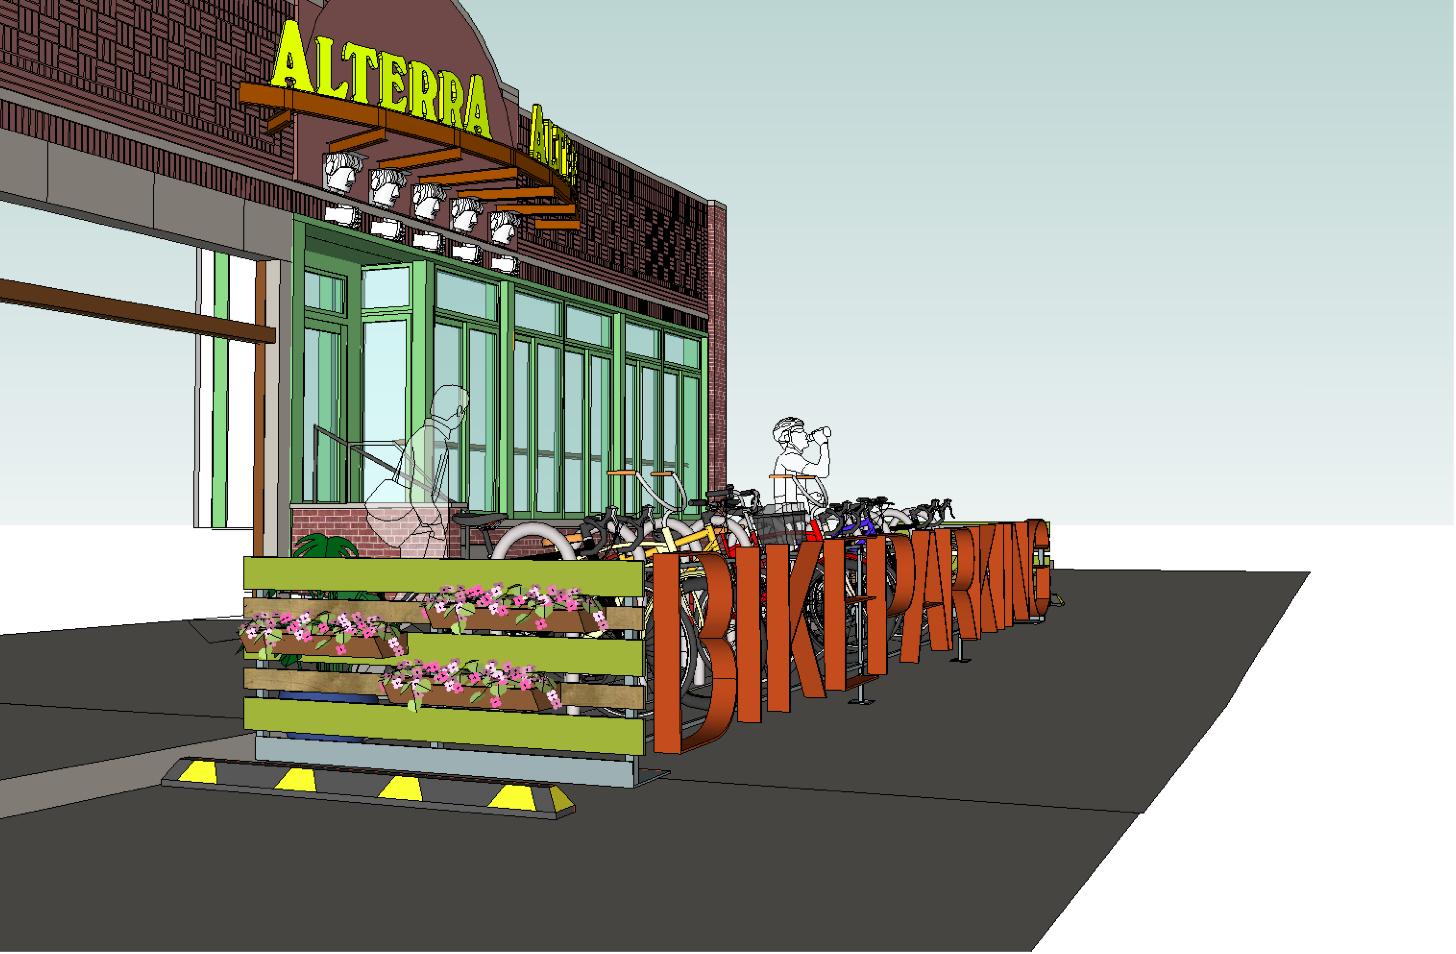 Alterra to Introduce On-Street Bike Parking to Milwaukee (Renderings)